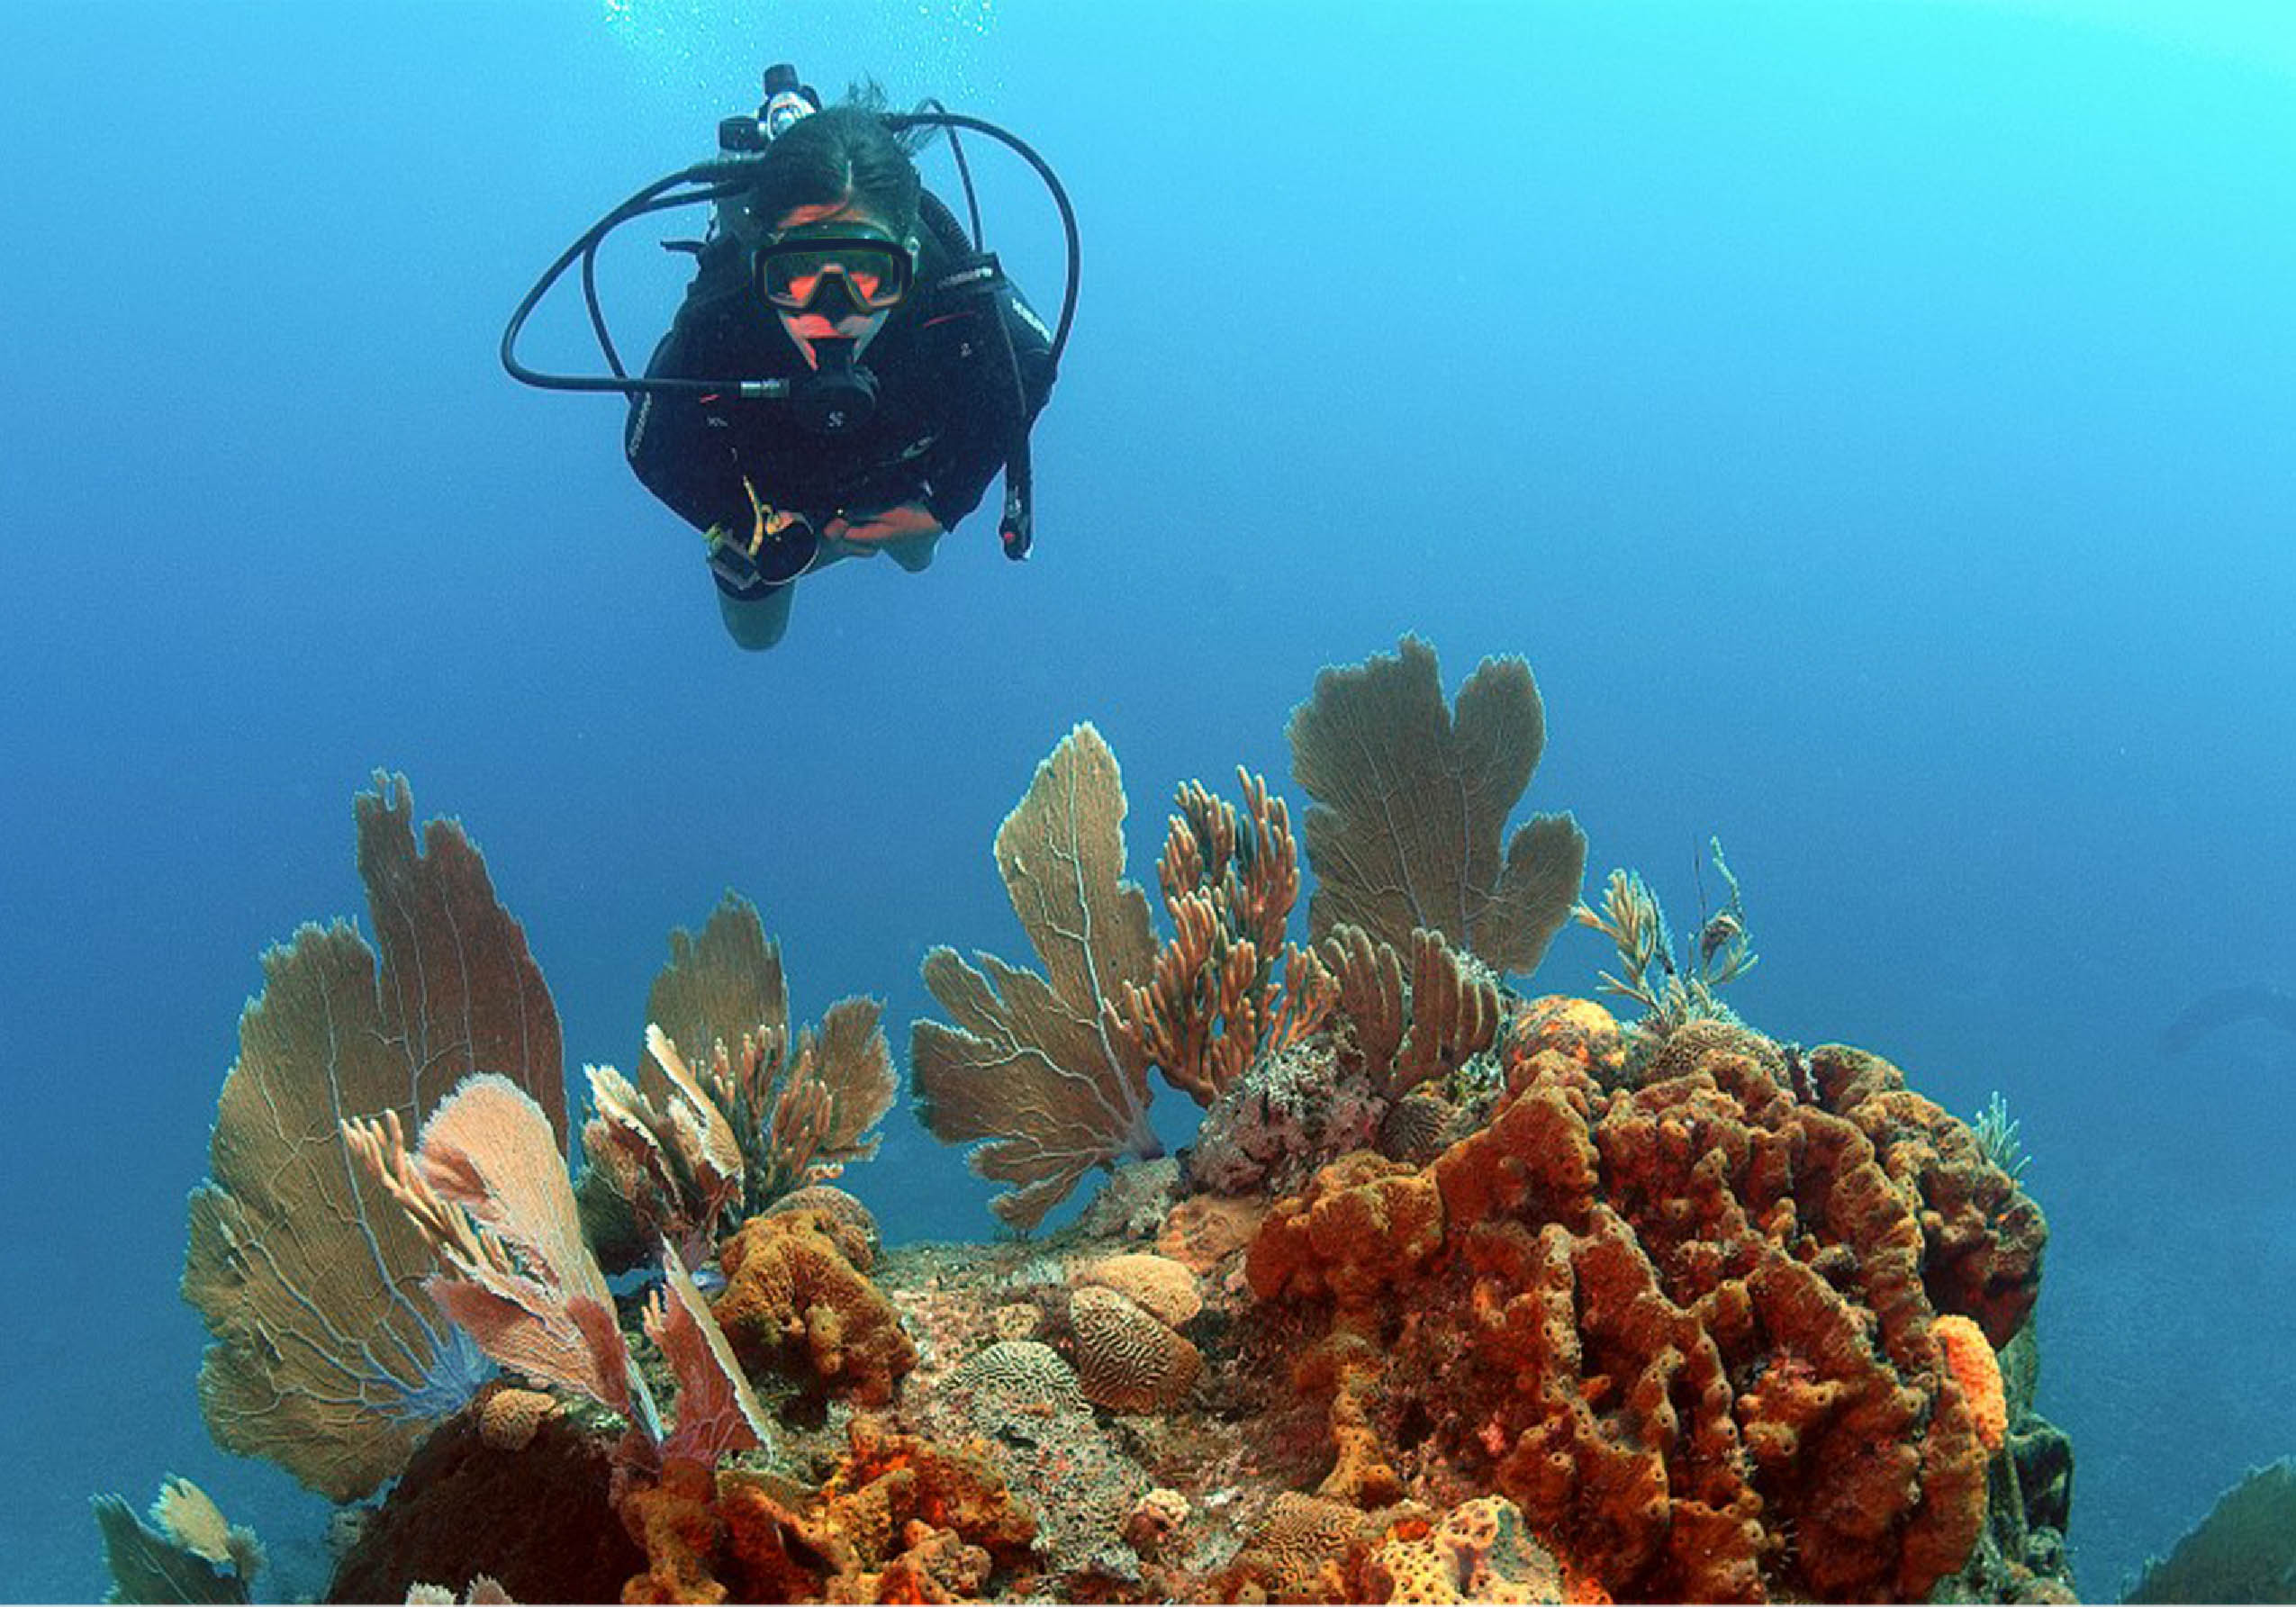 PADI Scuba Diver - watersports in Negril, Jamaica